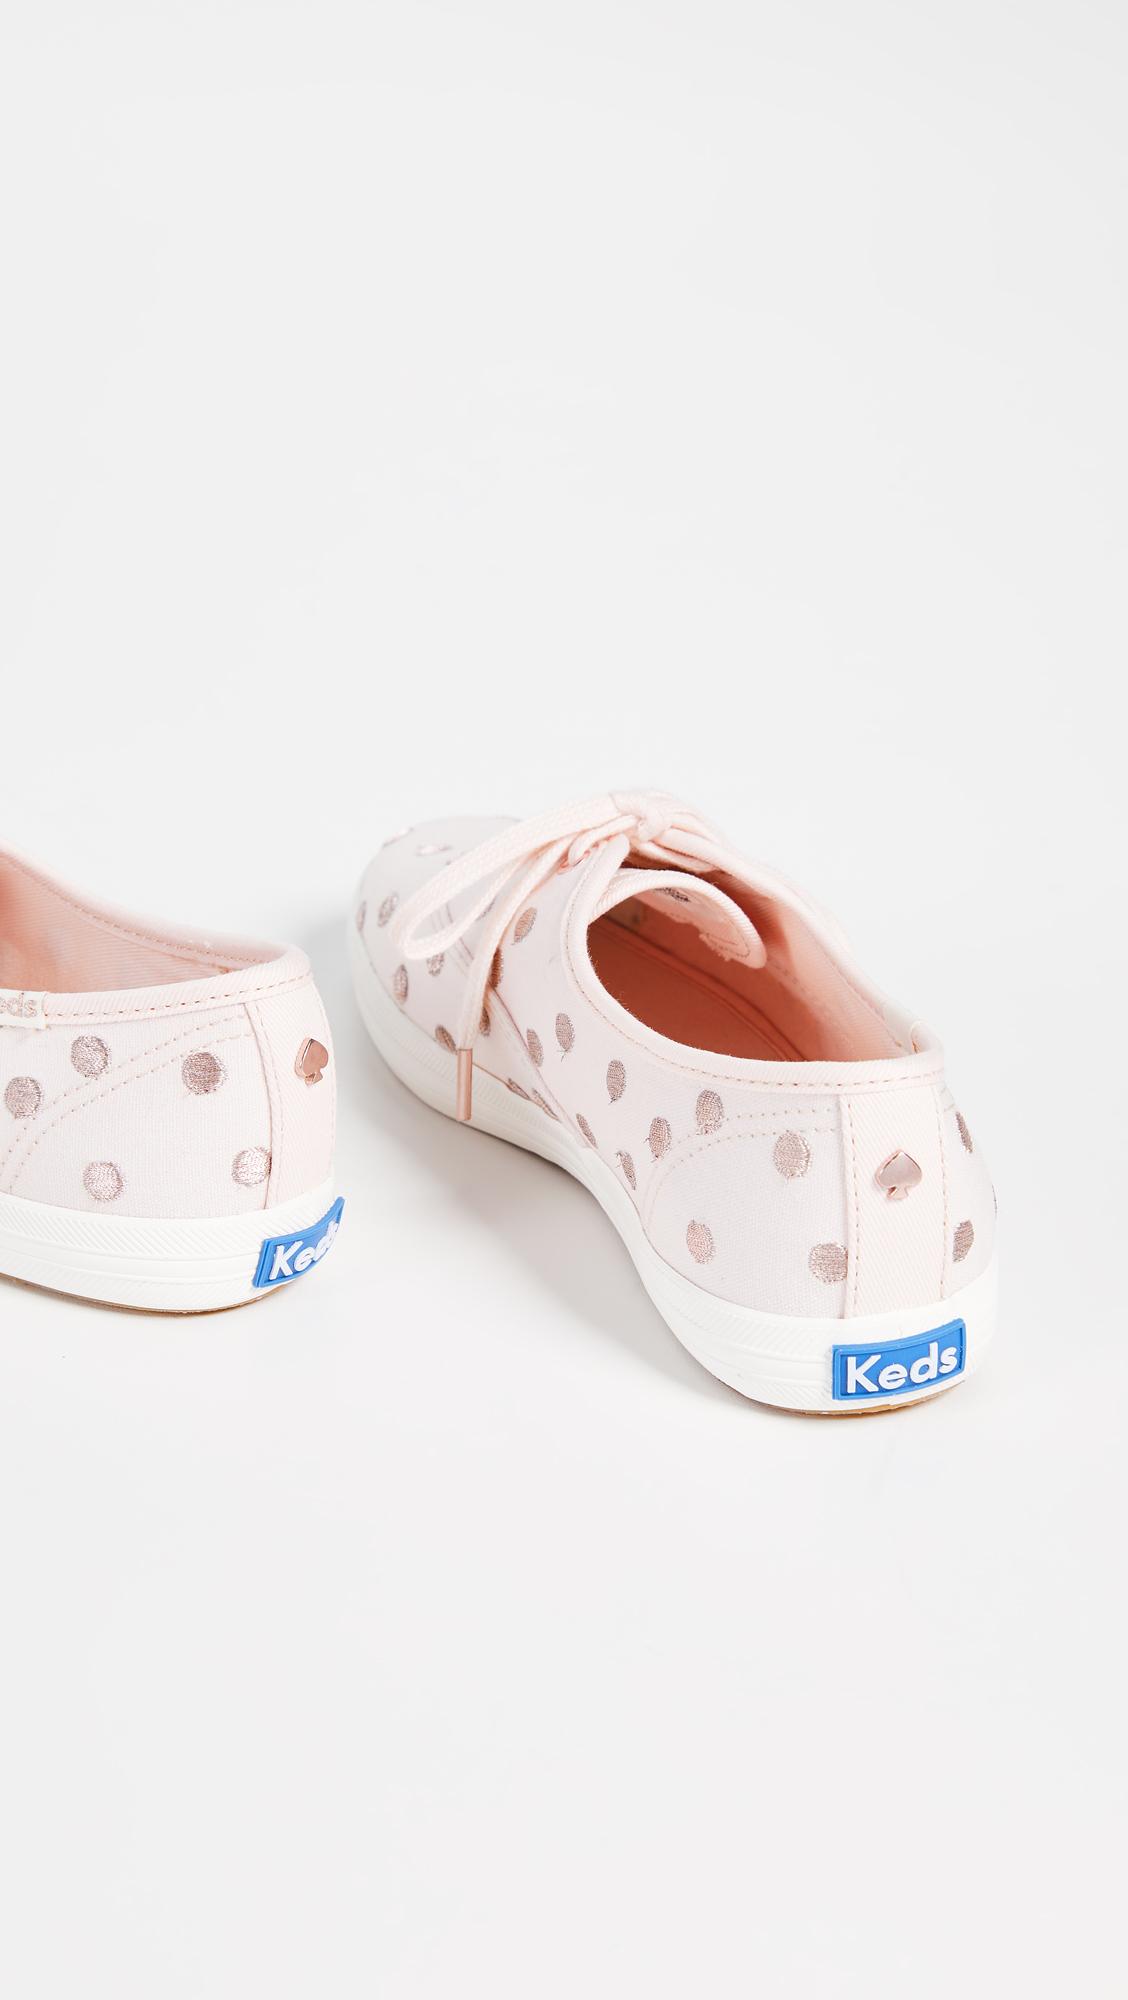 2f4582a93f5f Keds x Kate Spade Dancing Dot Sneakers